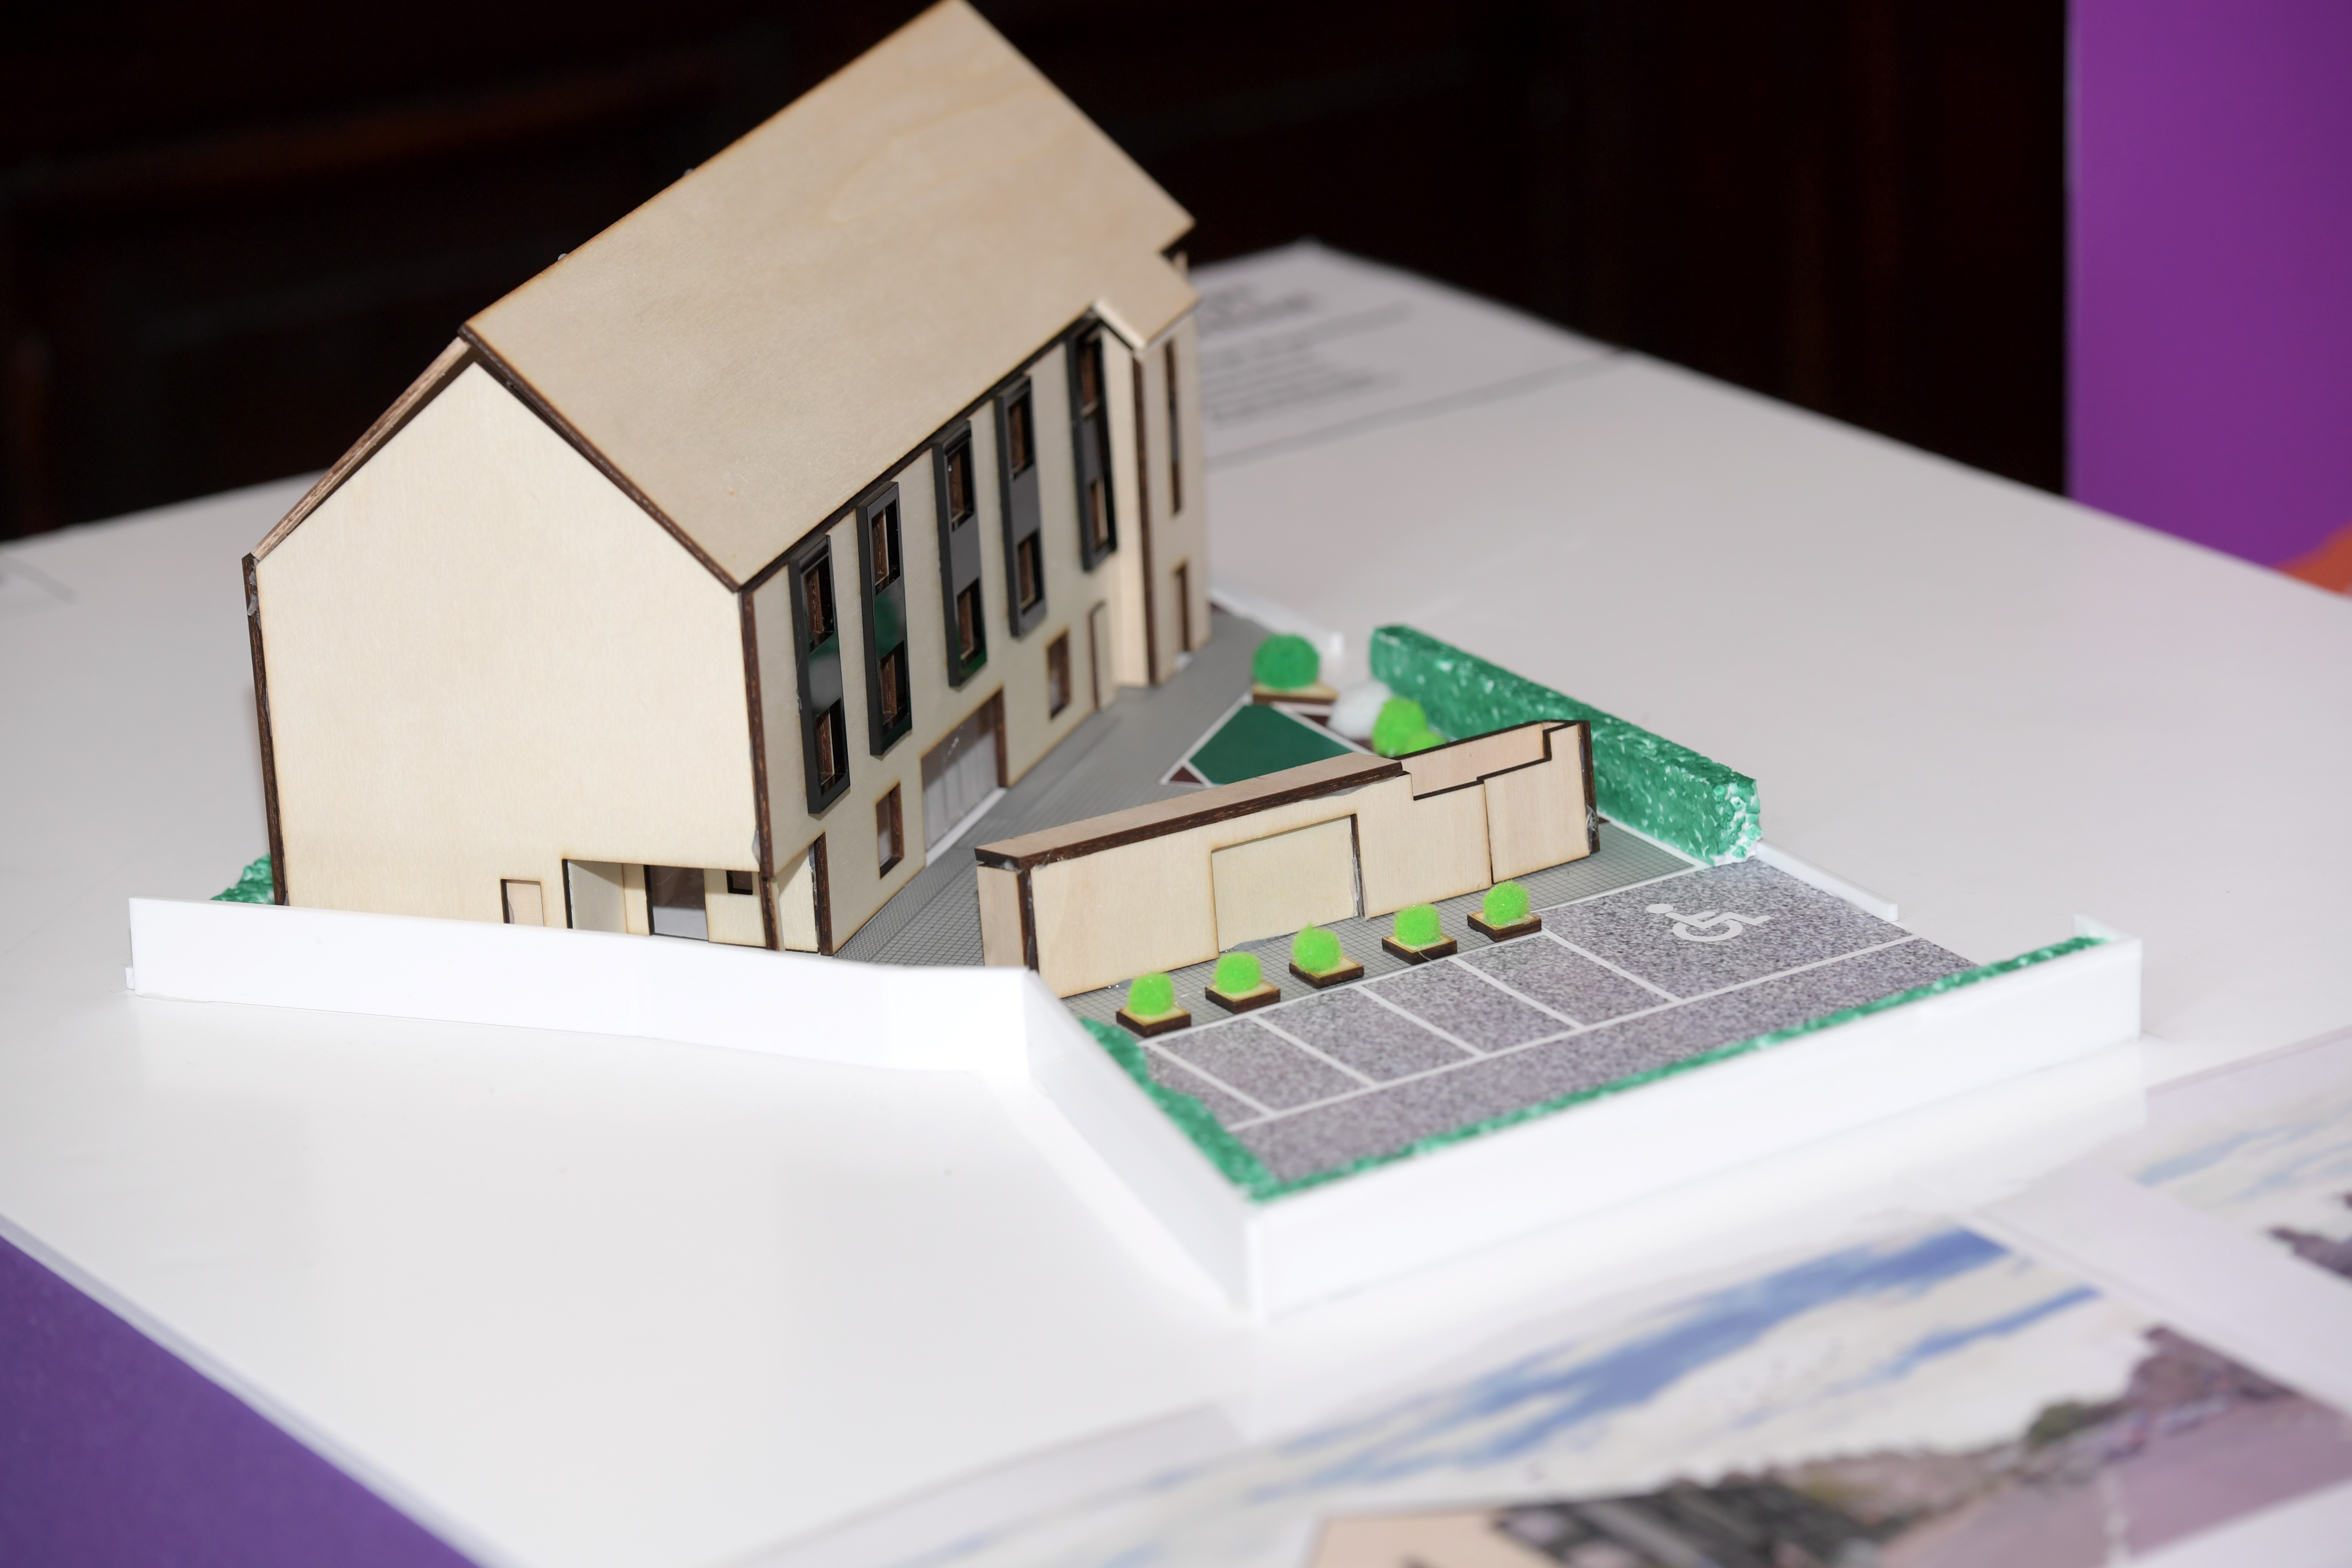 A miniature cardboard model of the proposed VSA facility.